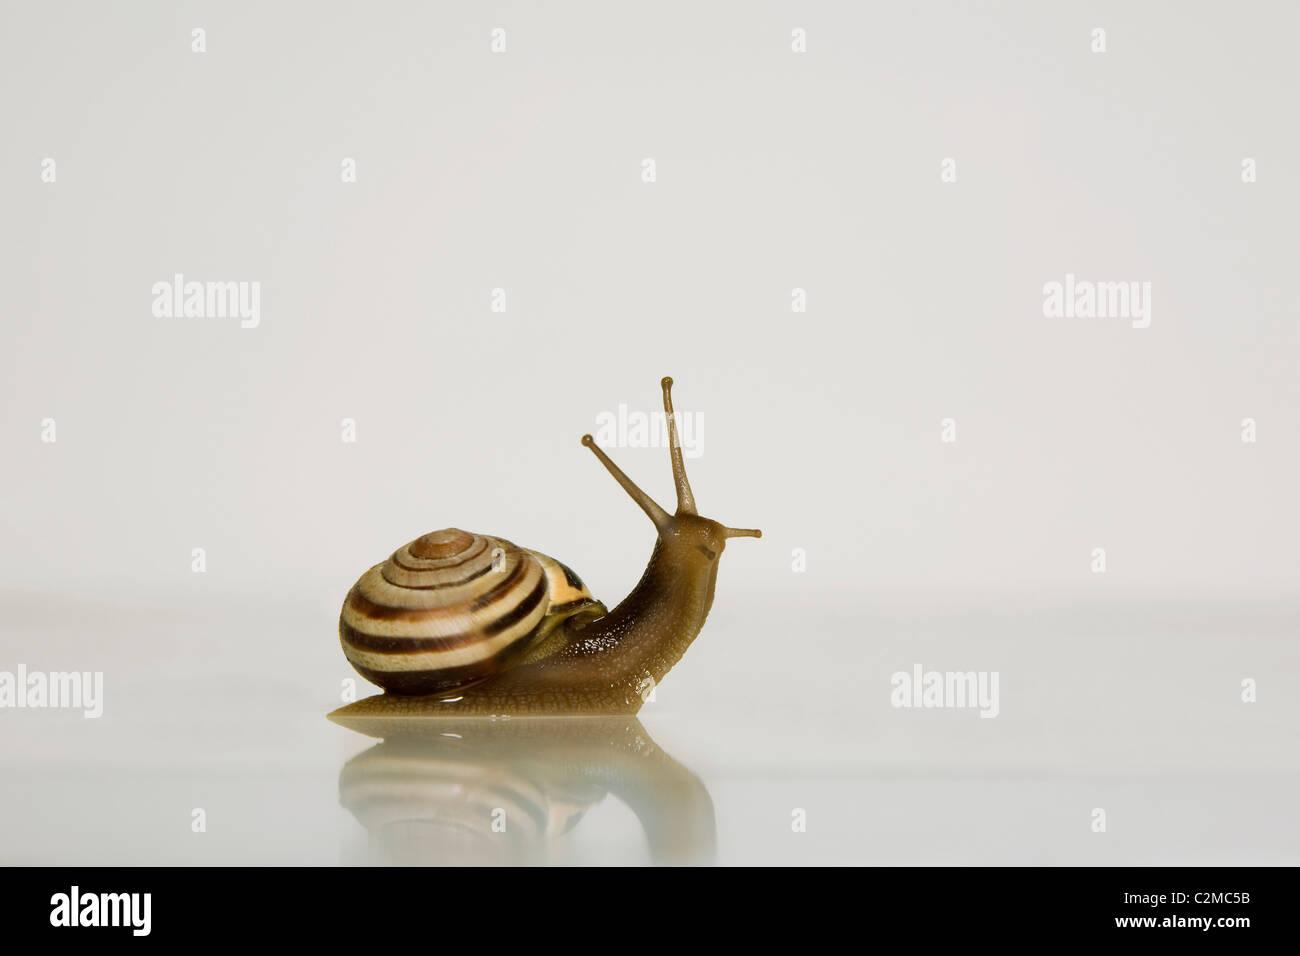 Escargot de jardin Photo Stock